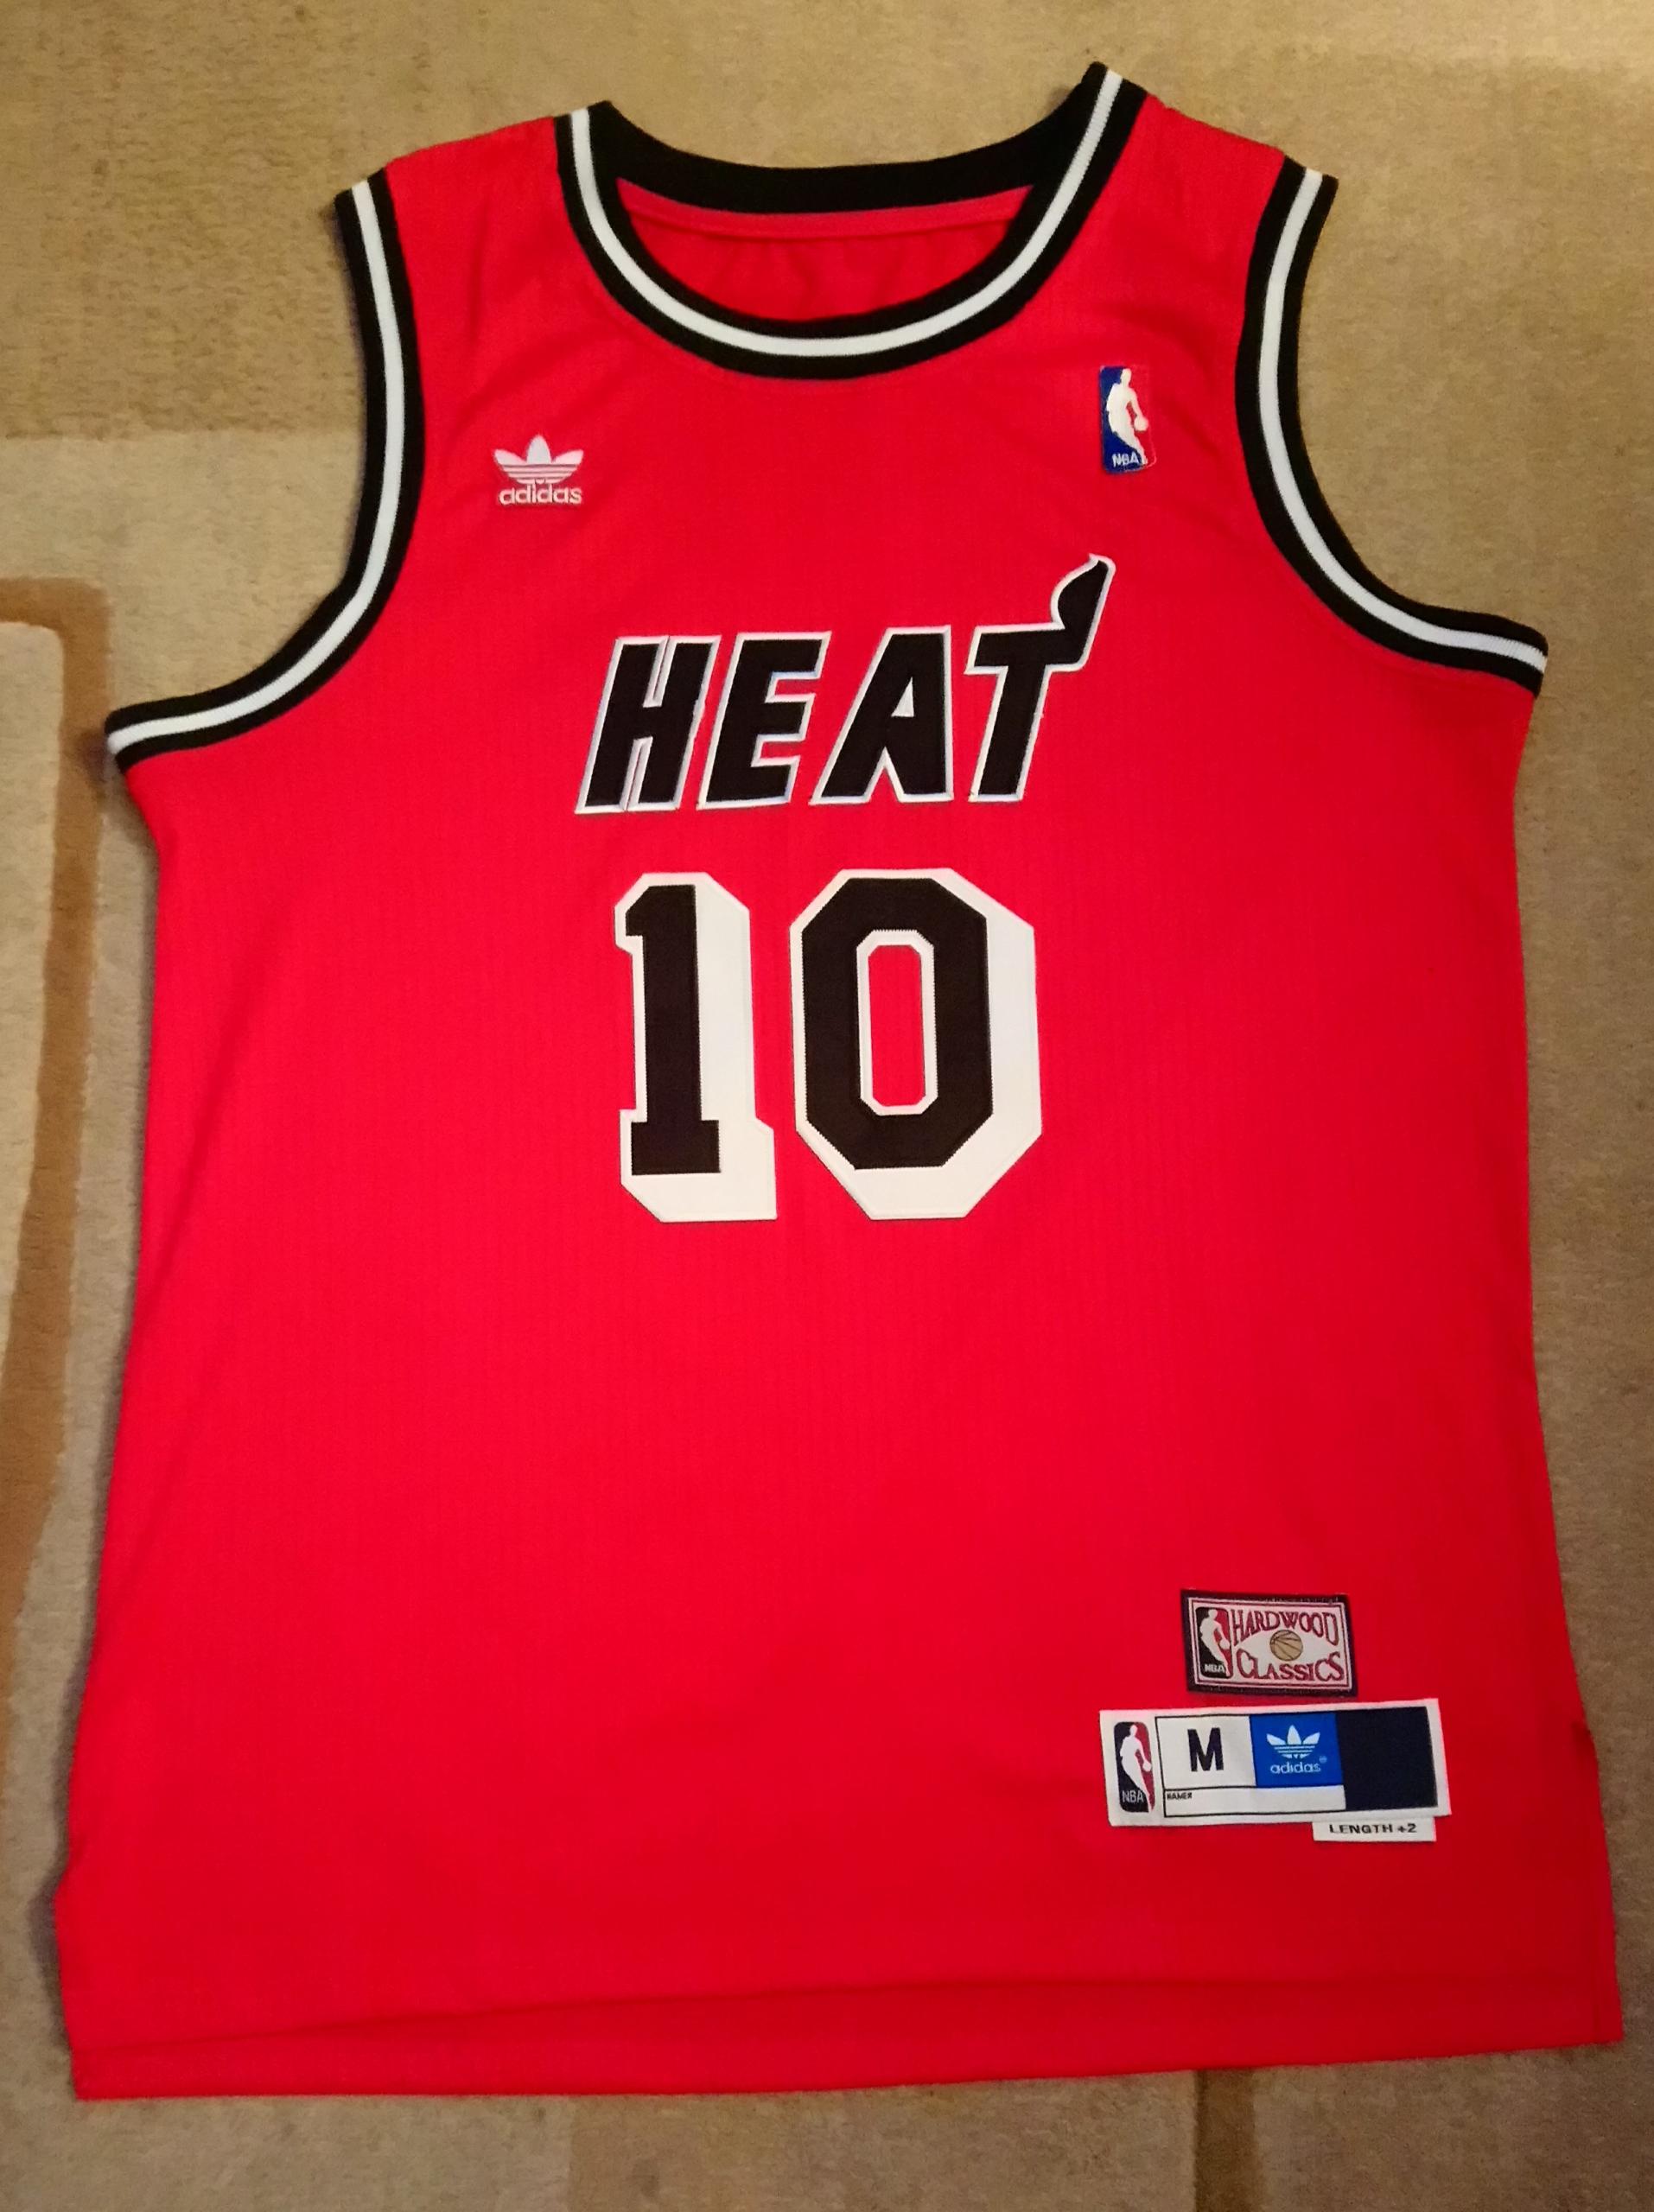 Tim Hardaway MIAMI HEAT koszulka NBA okazja